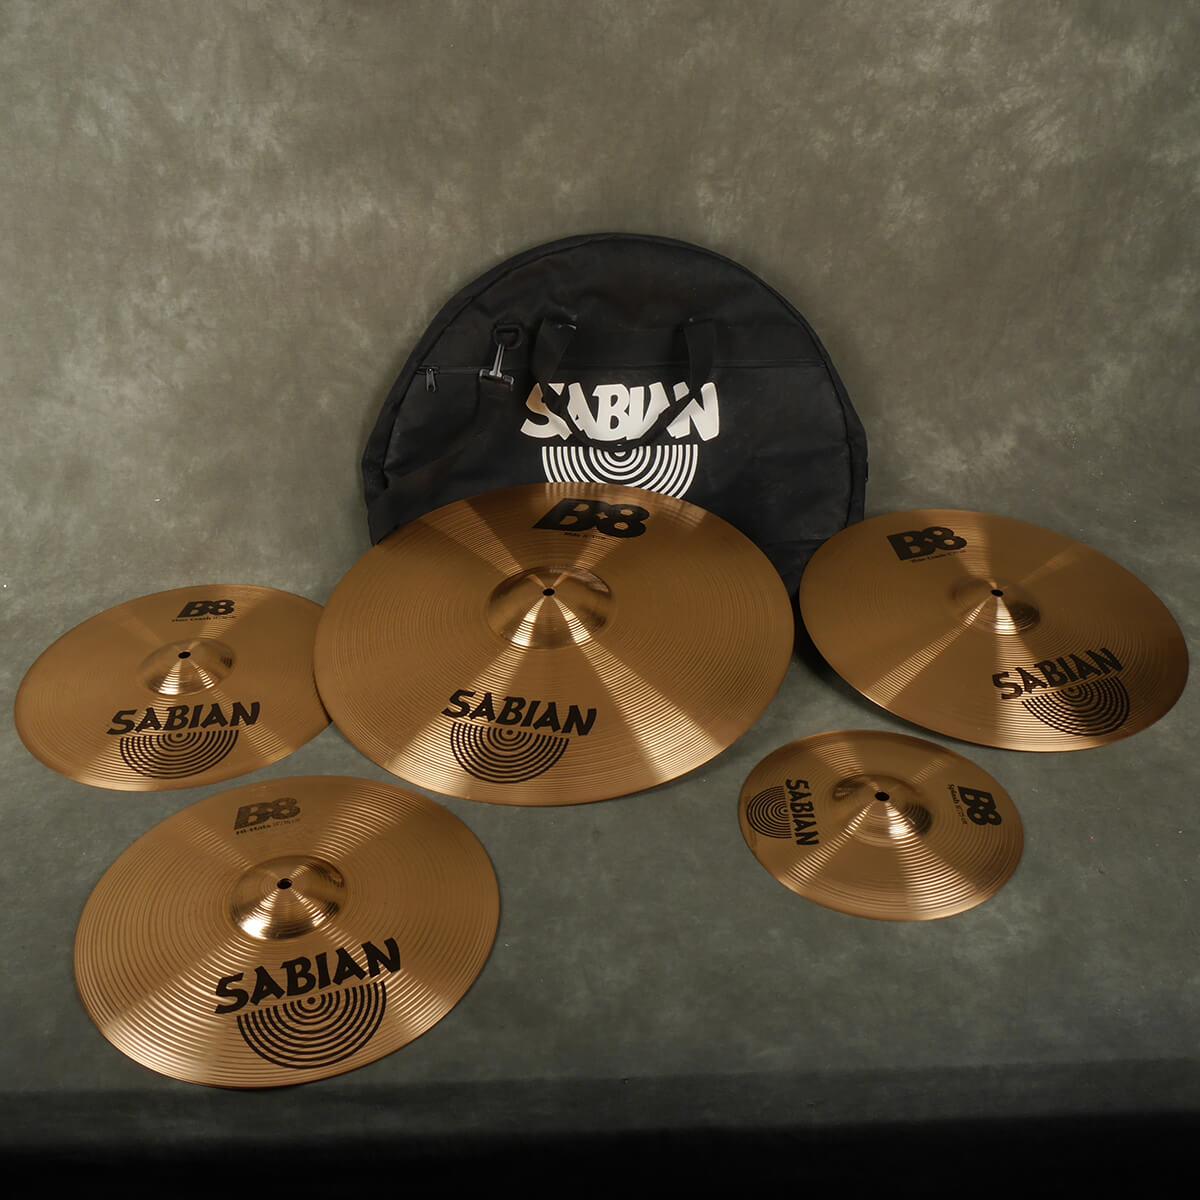 Sabian B8 Cymbal Set - 10-14-14-16-20 inch w/Gig Bag - 2nd Hand